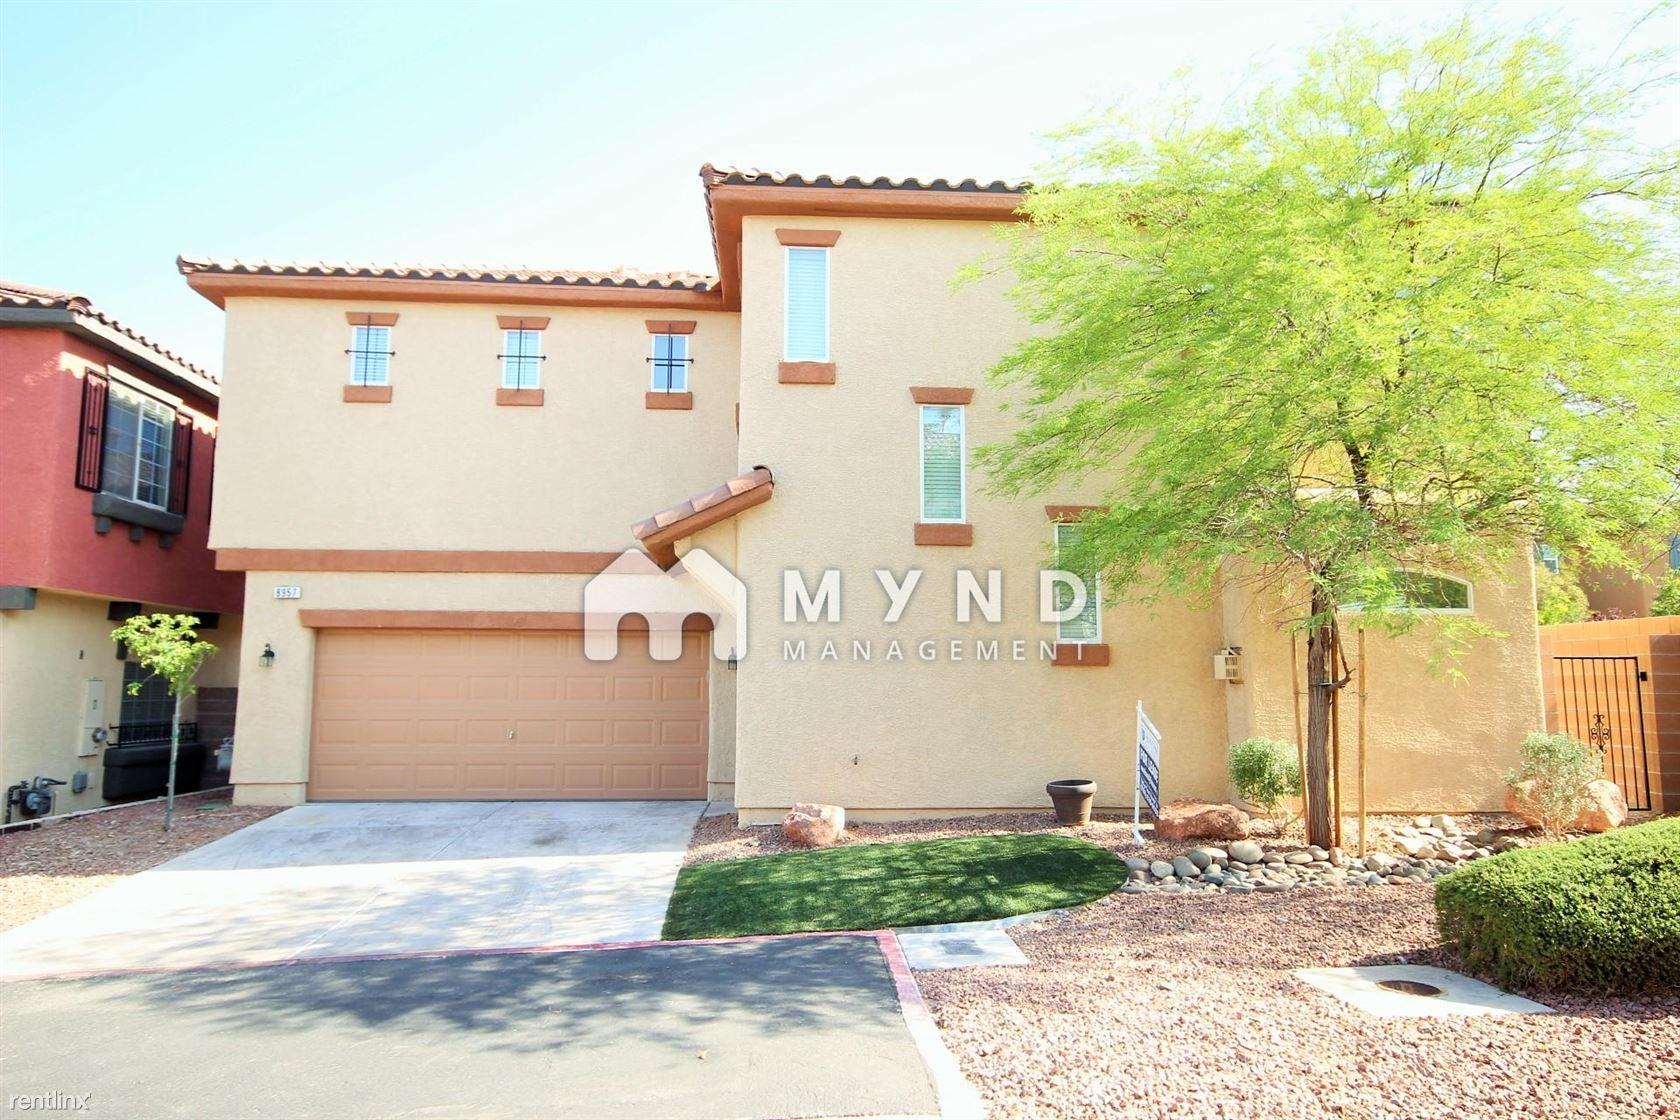 8957 Misty Mill Ct, Las Vegas, NV - 1,995 USD/ month